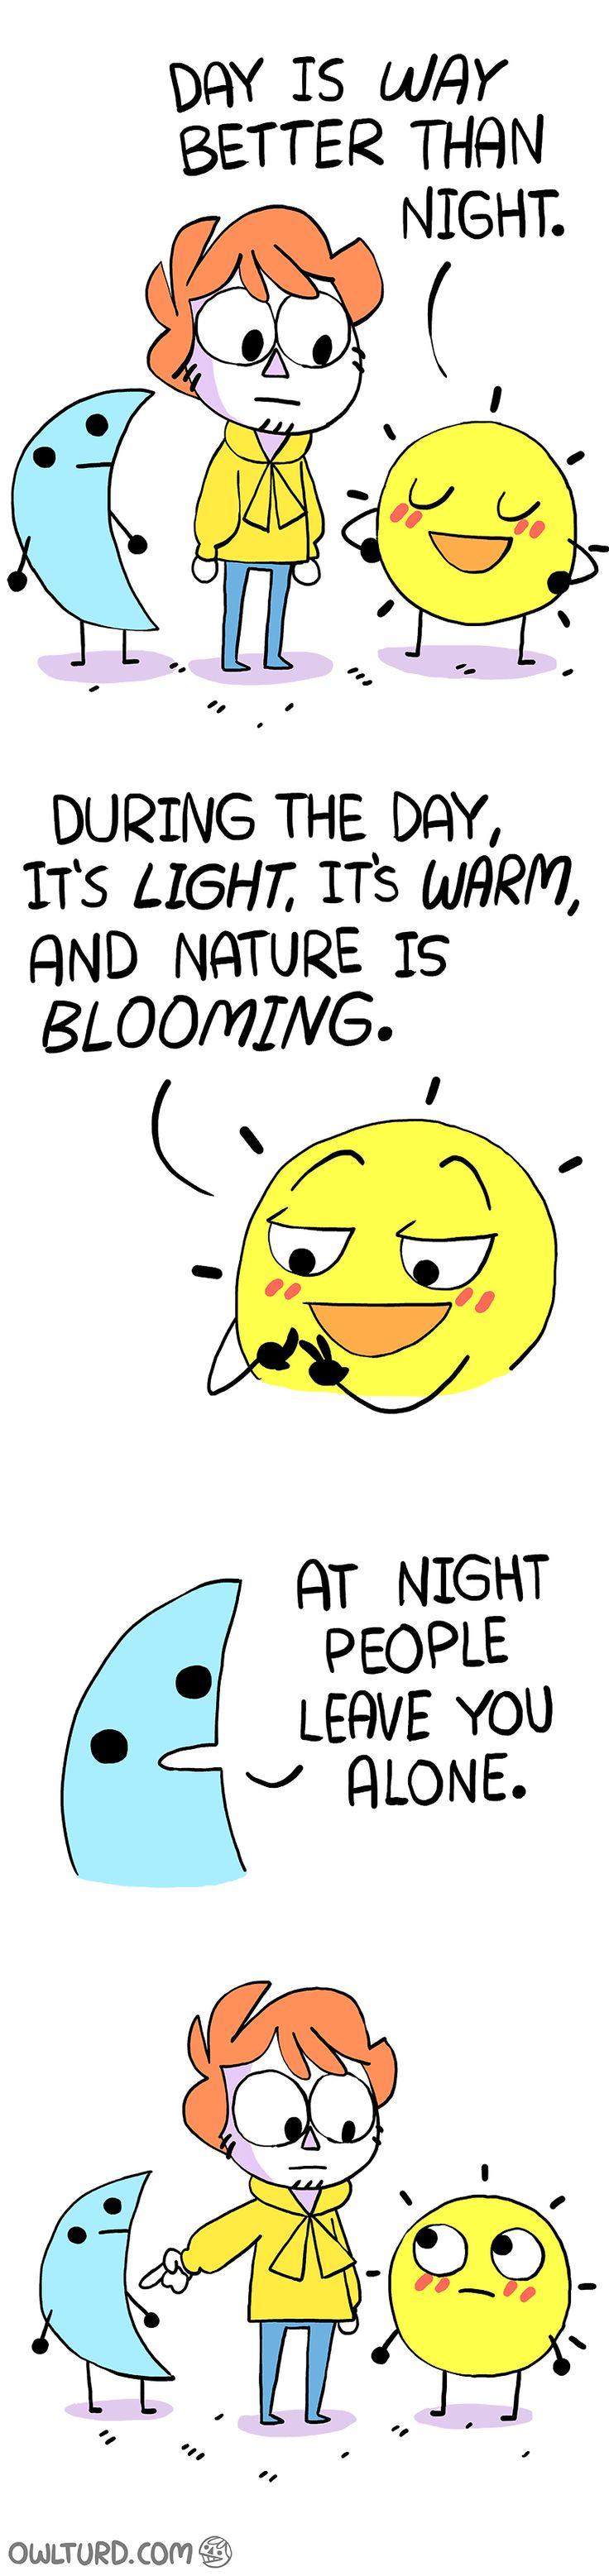 Best Funny Comics Ideas On Pinterest Im Sad Sushi Go And - Amusing illustrations will put smile face